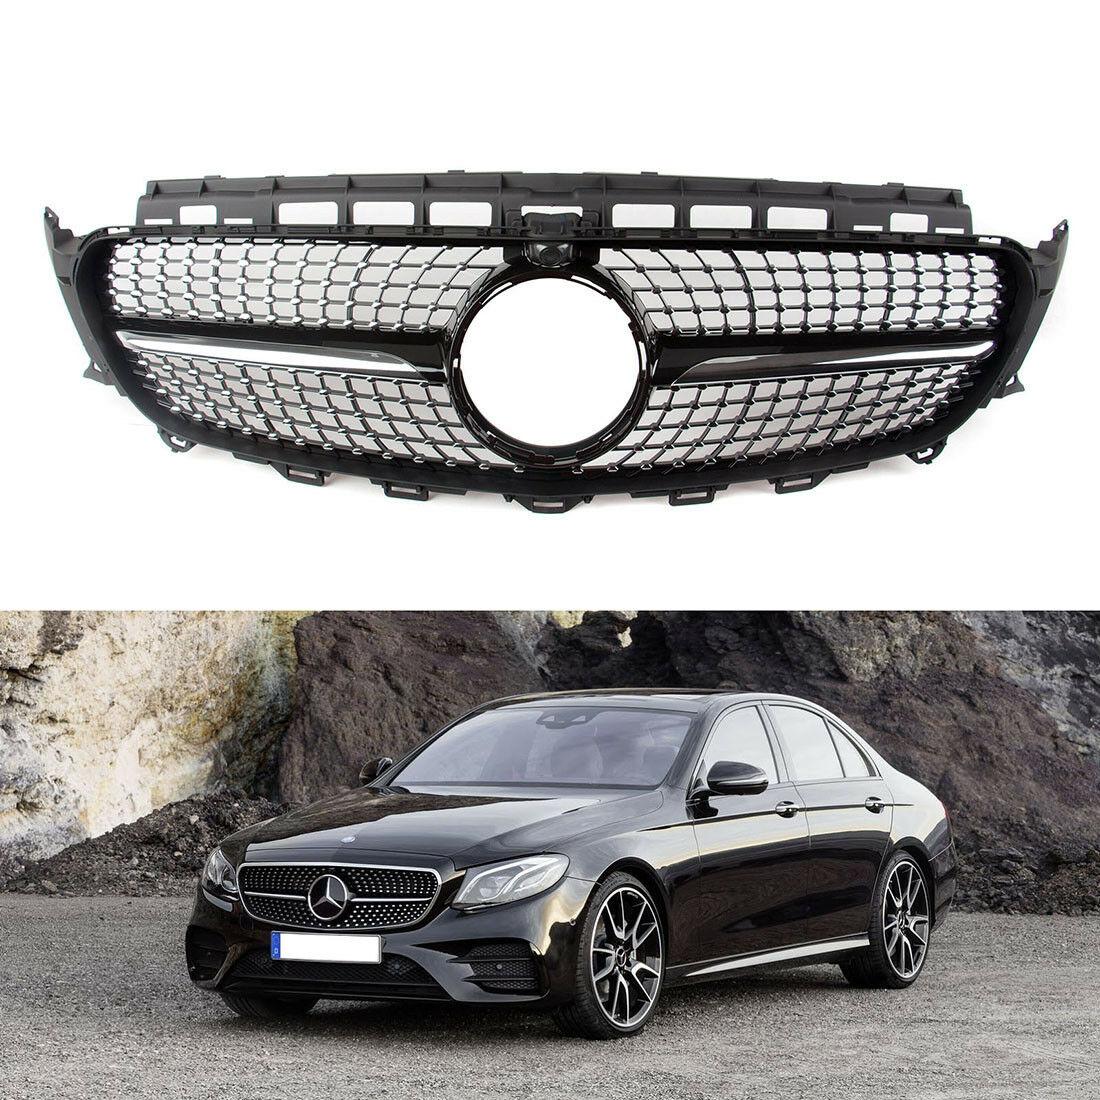 Mercedes W213 E class Diamond Grille Sport Avantgarde Benz 2016 2017 Black AMG